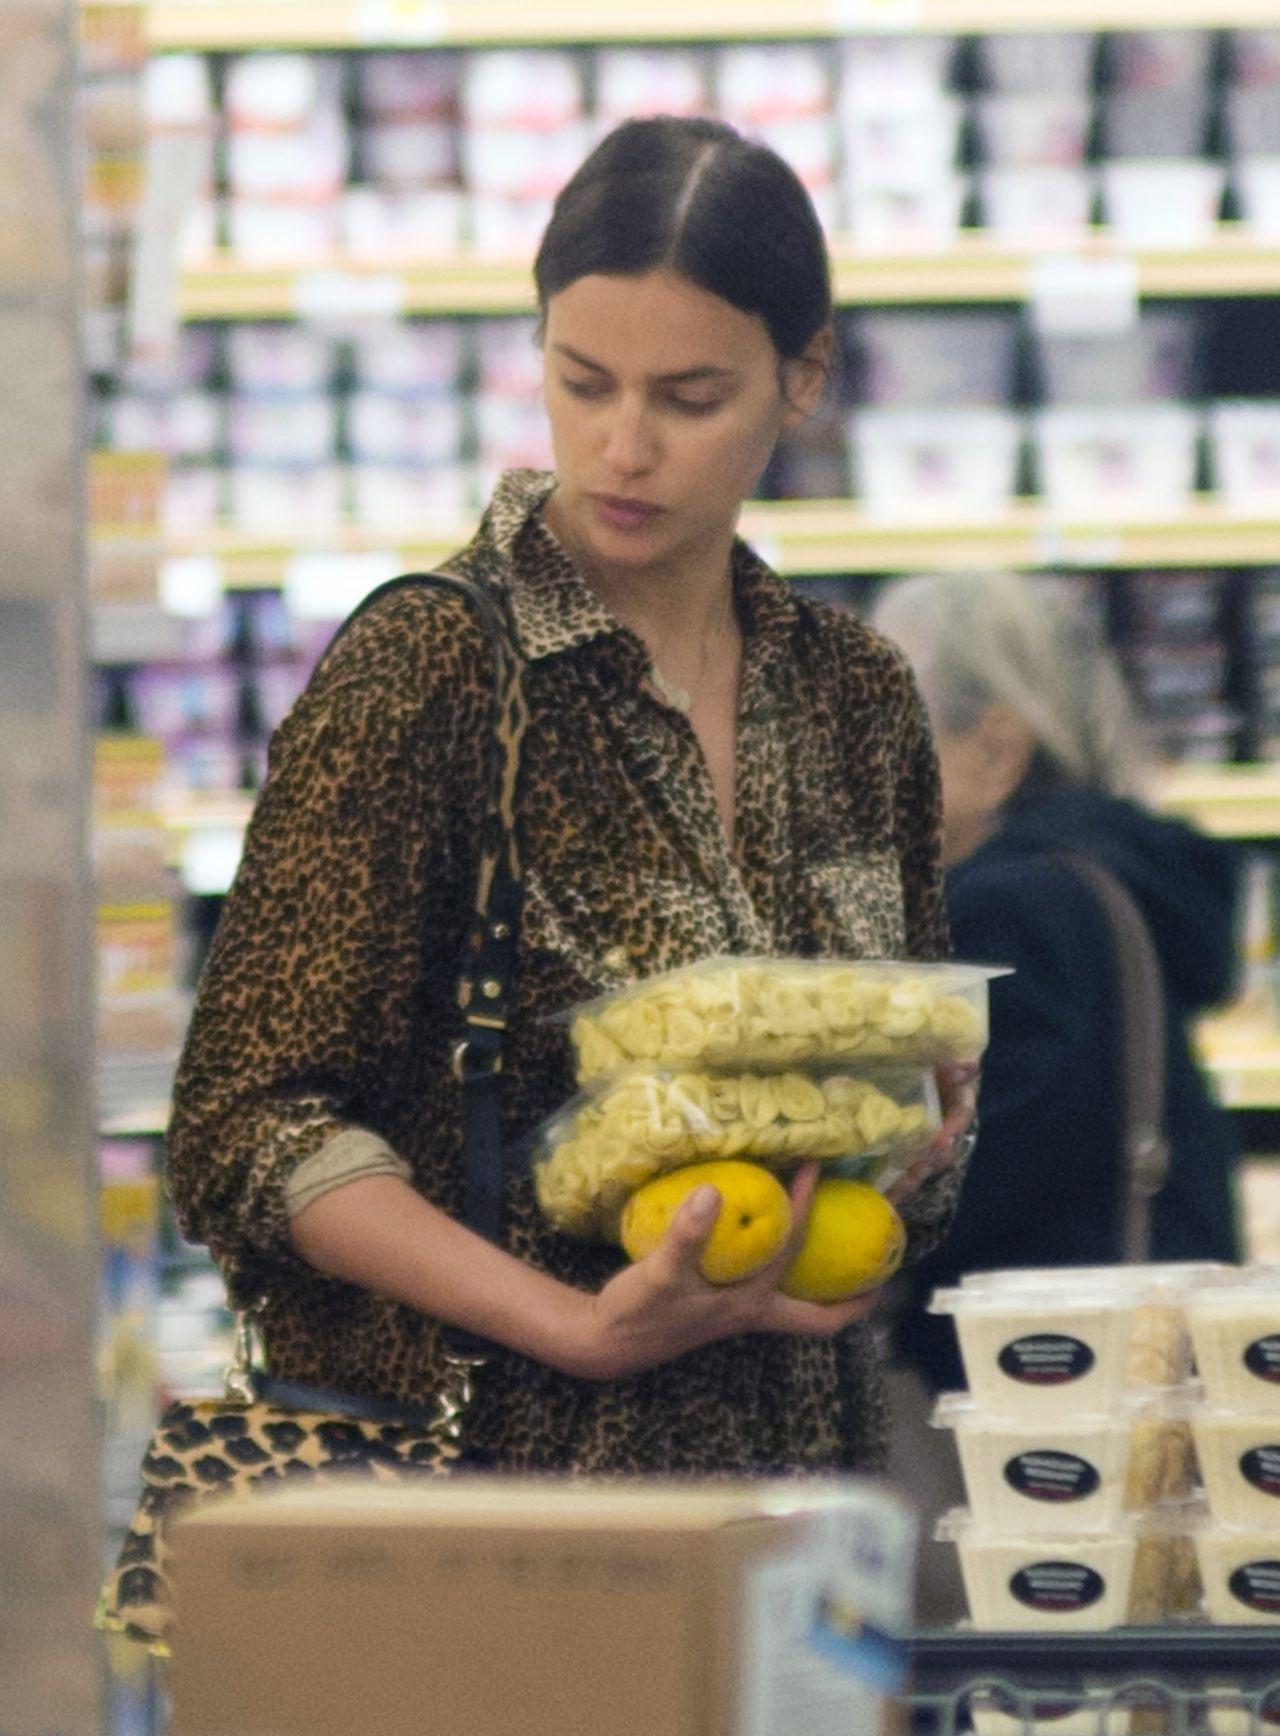 Irina Shayk And Bradley Cooper Grocery Shopping In Los